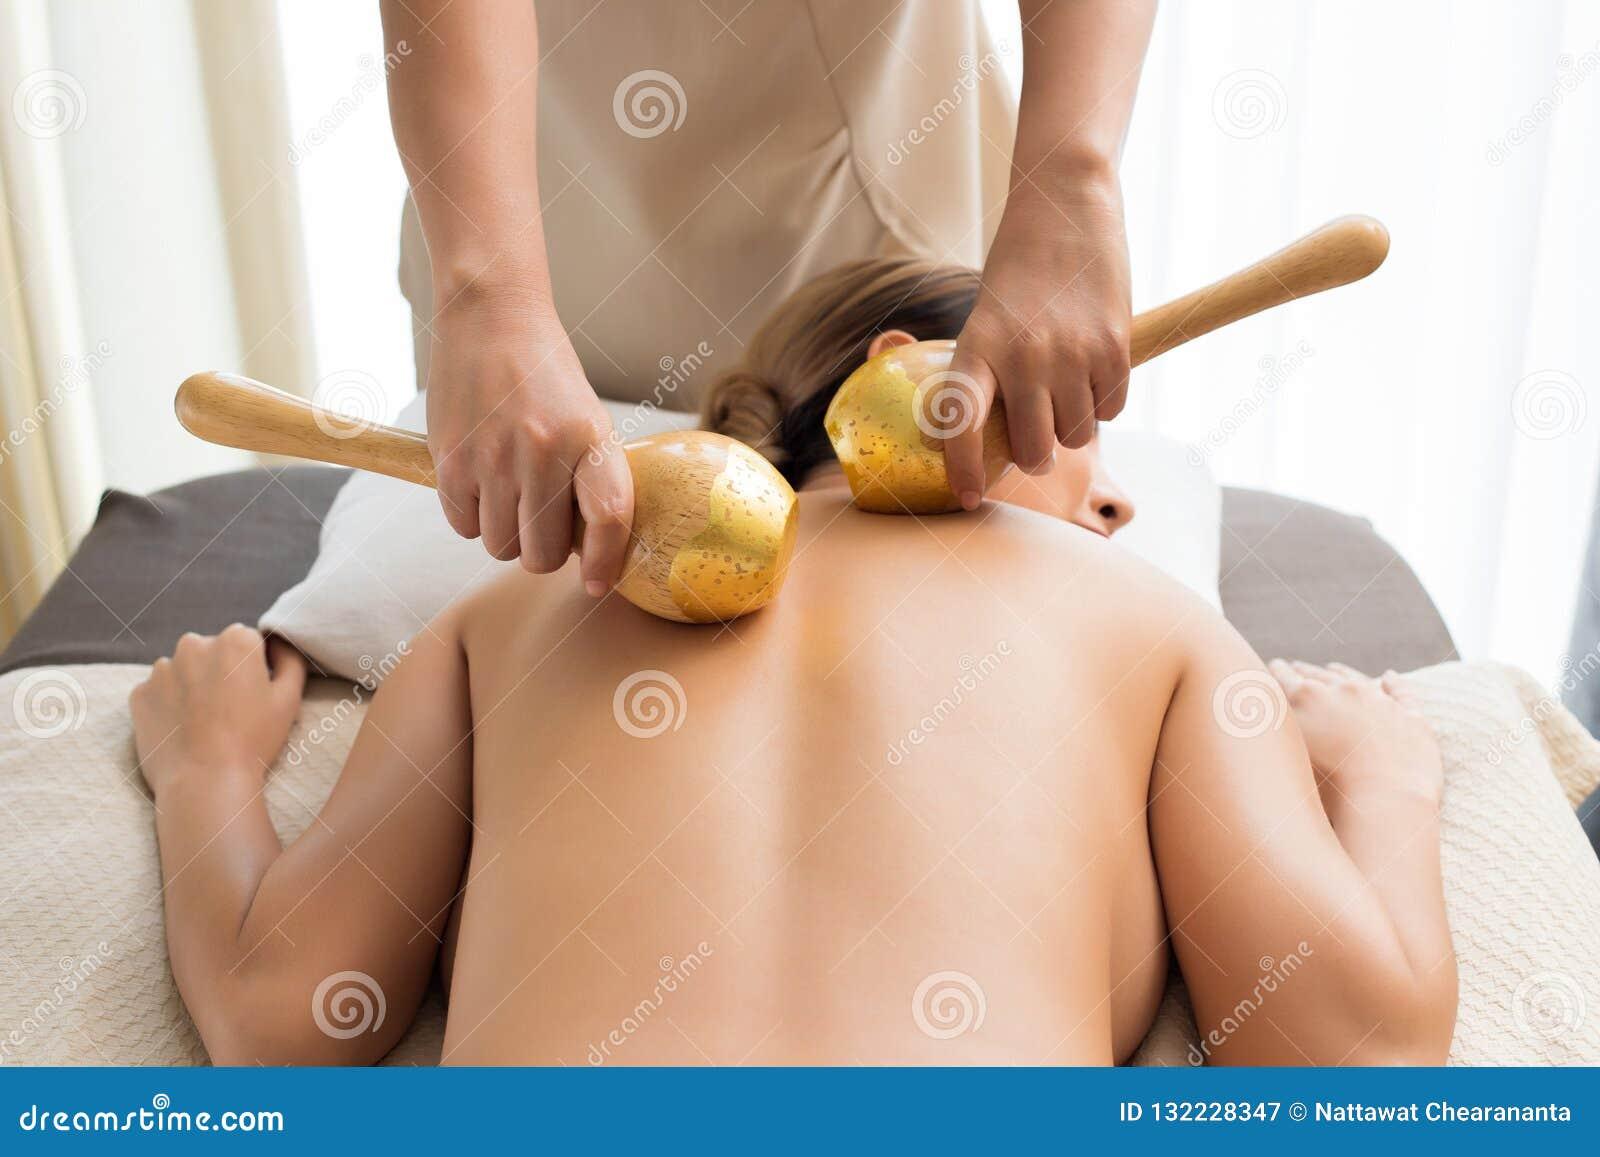 Gold Leaf Golden Wood Pressure Spa Massage Stock Image Image Of Lifestyle Procedure 132228347